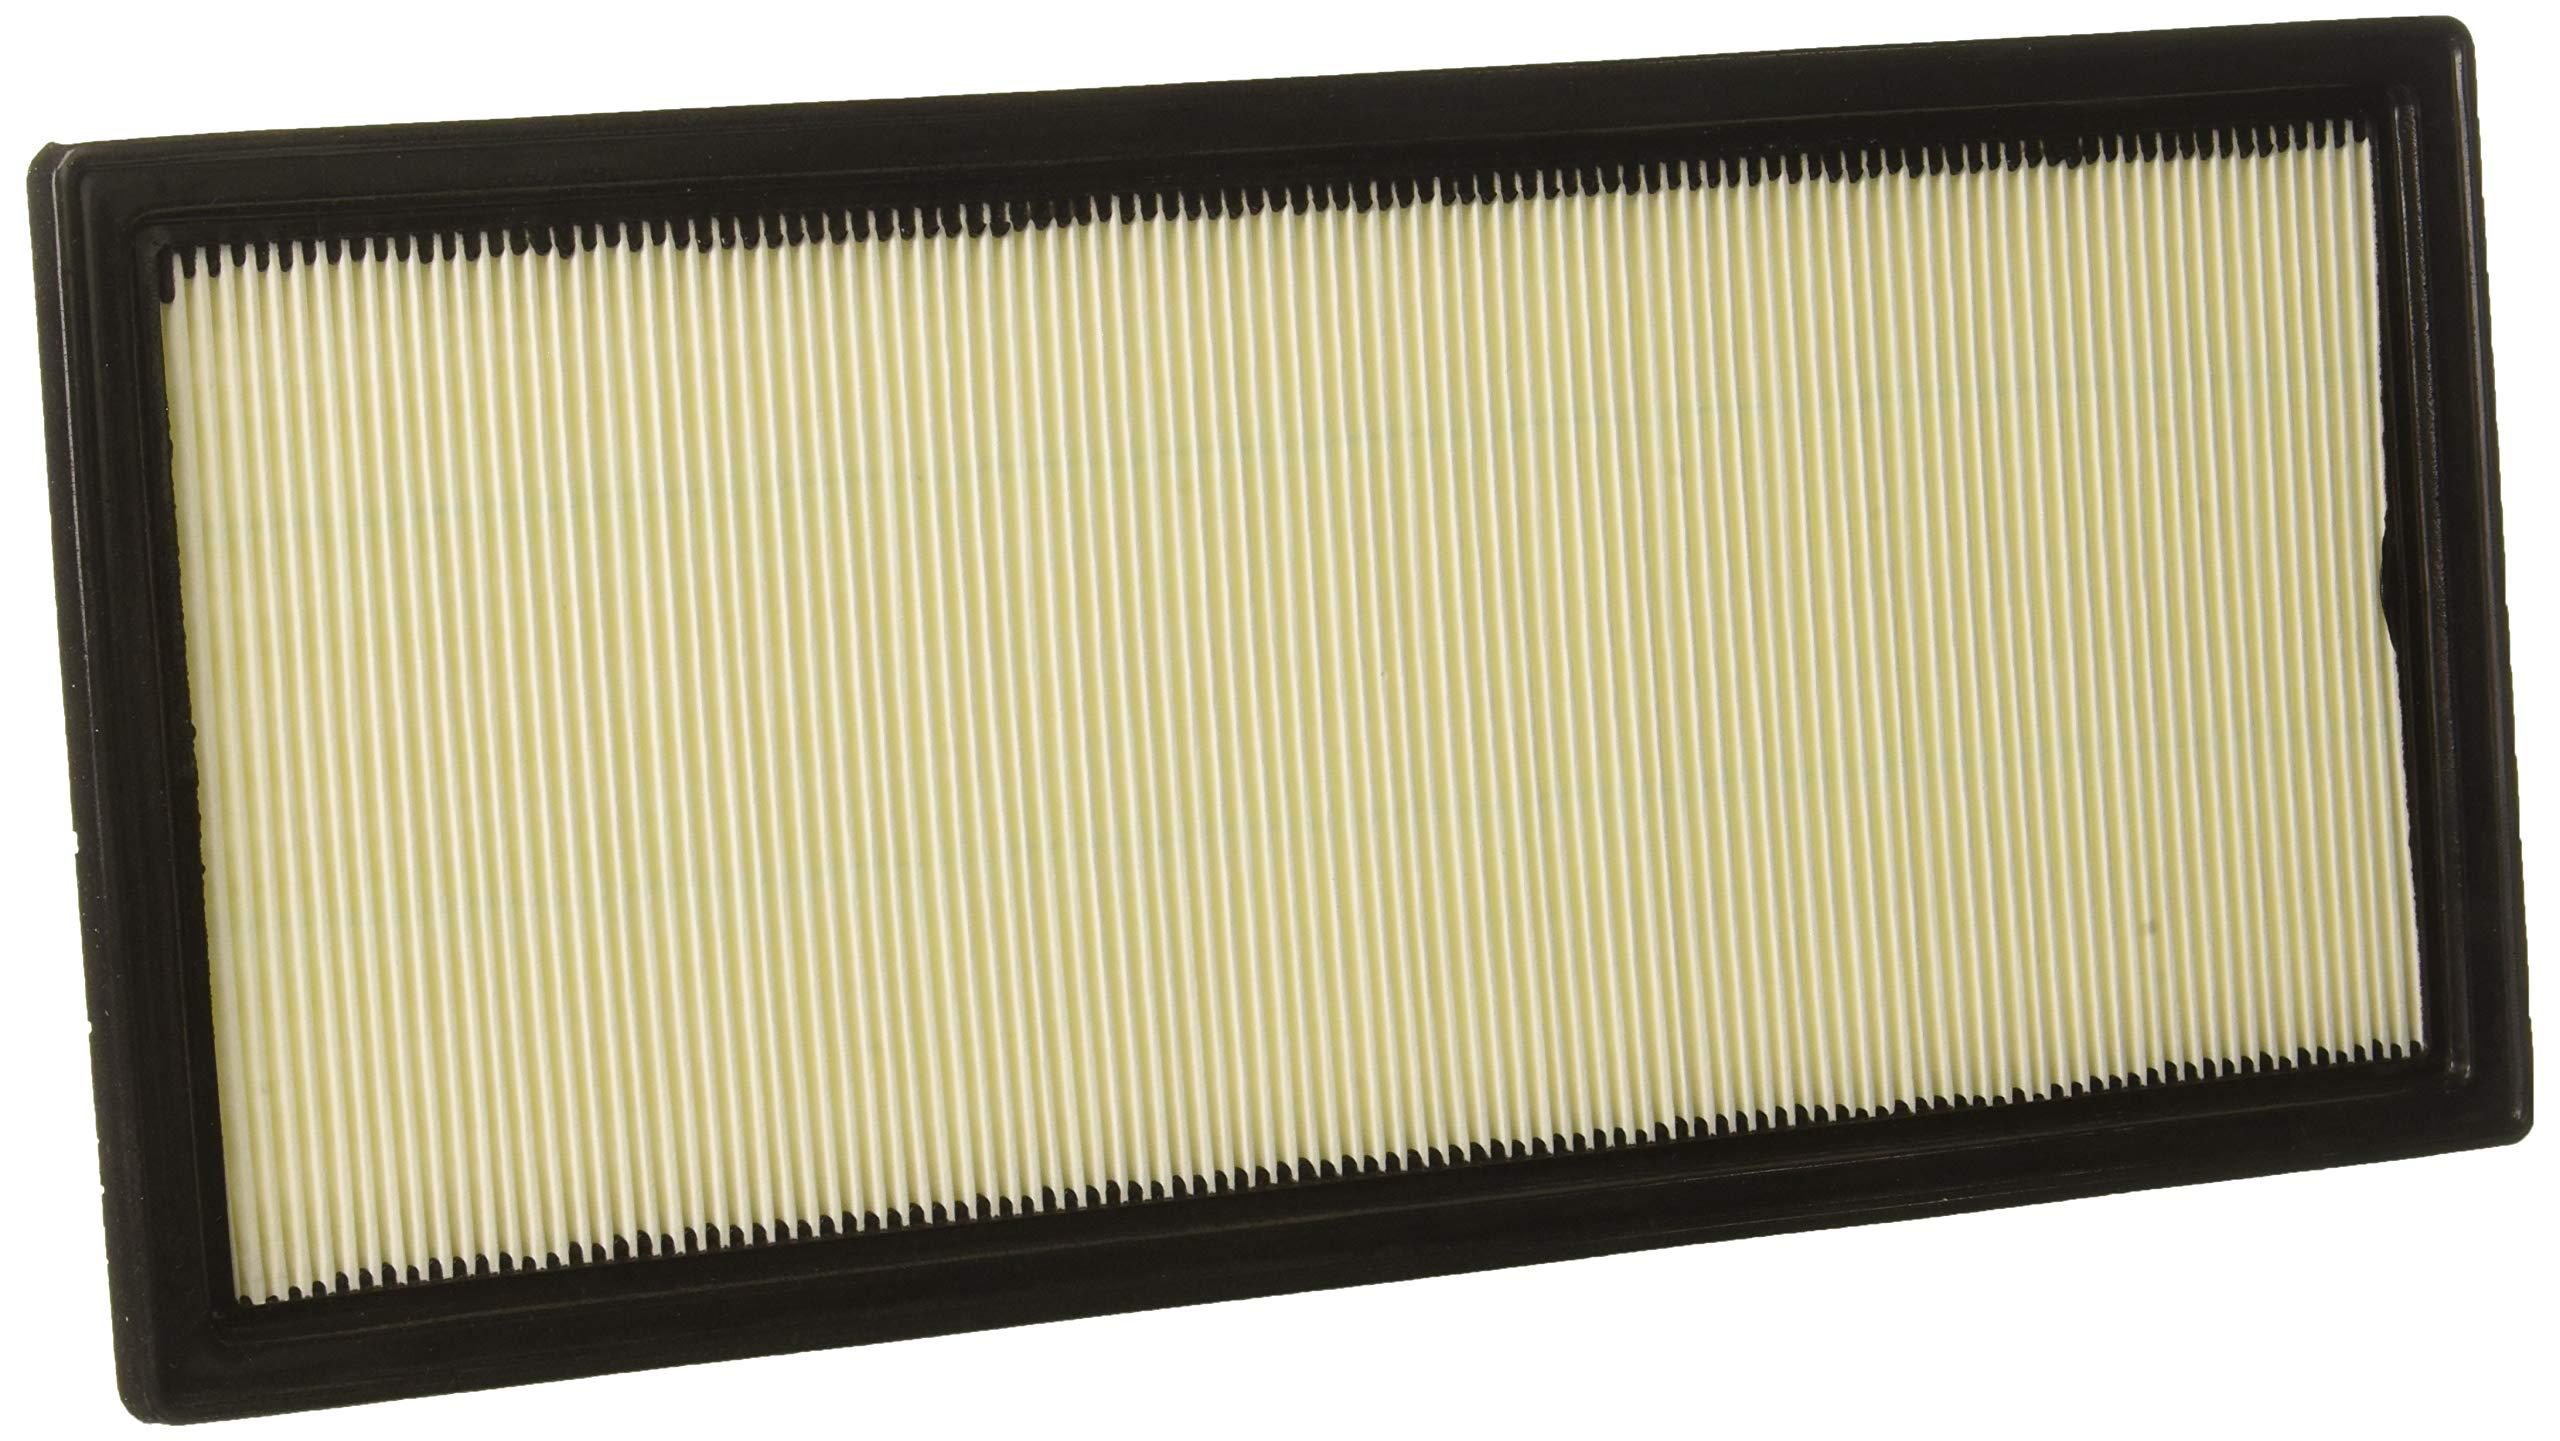 Bosch Workshop Air Filter 5123WS (Subaru)